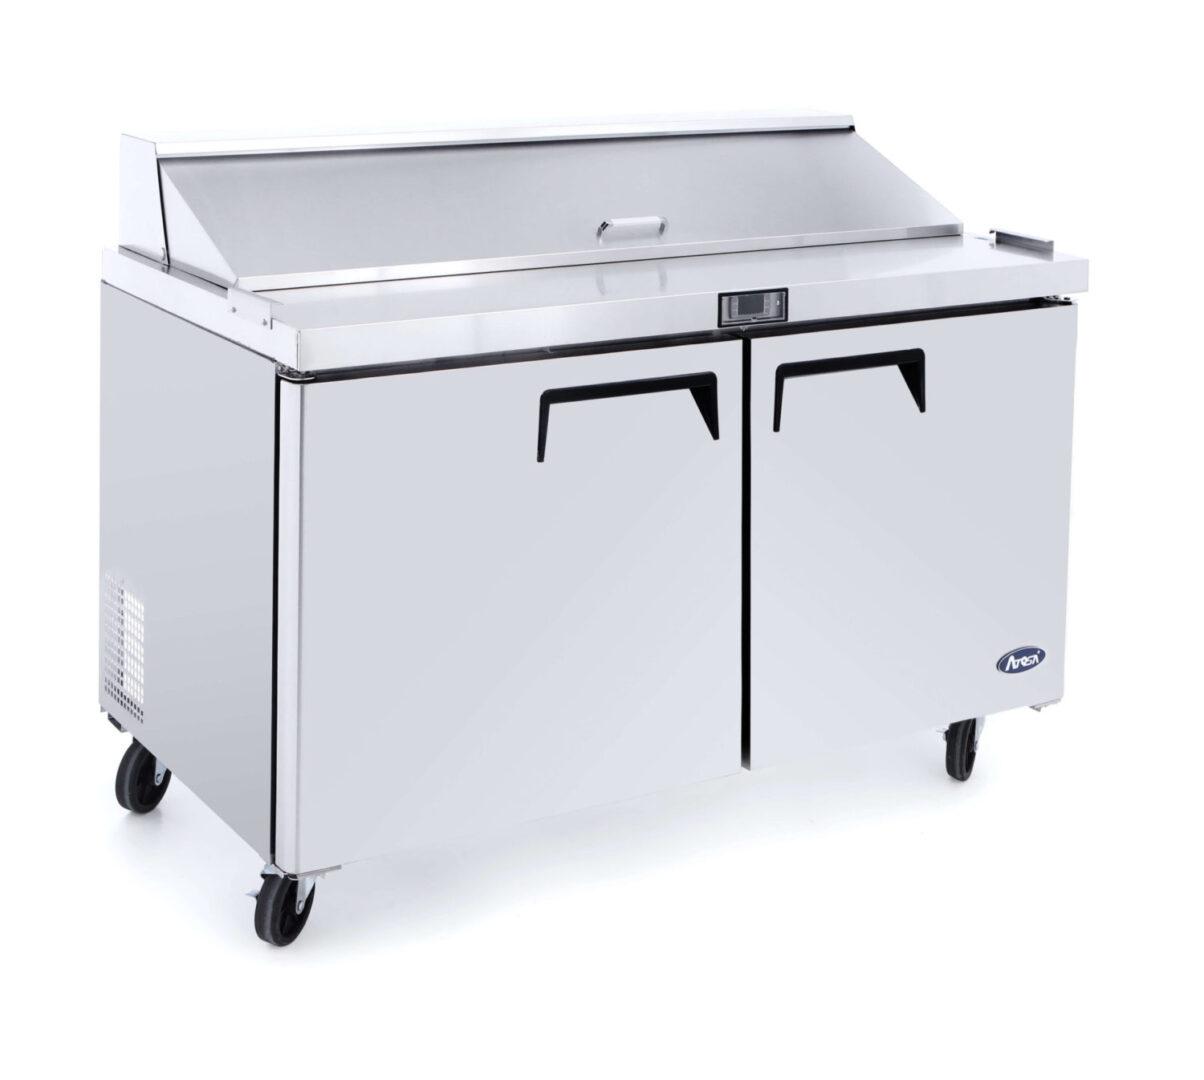 Atosa MSF8302 2 Door Sandwich Prep Table Refrigerator 1225 mm